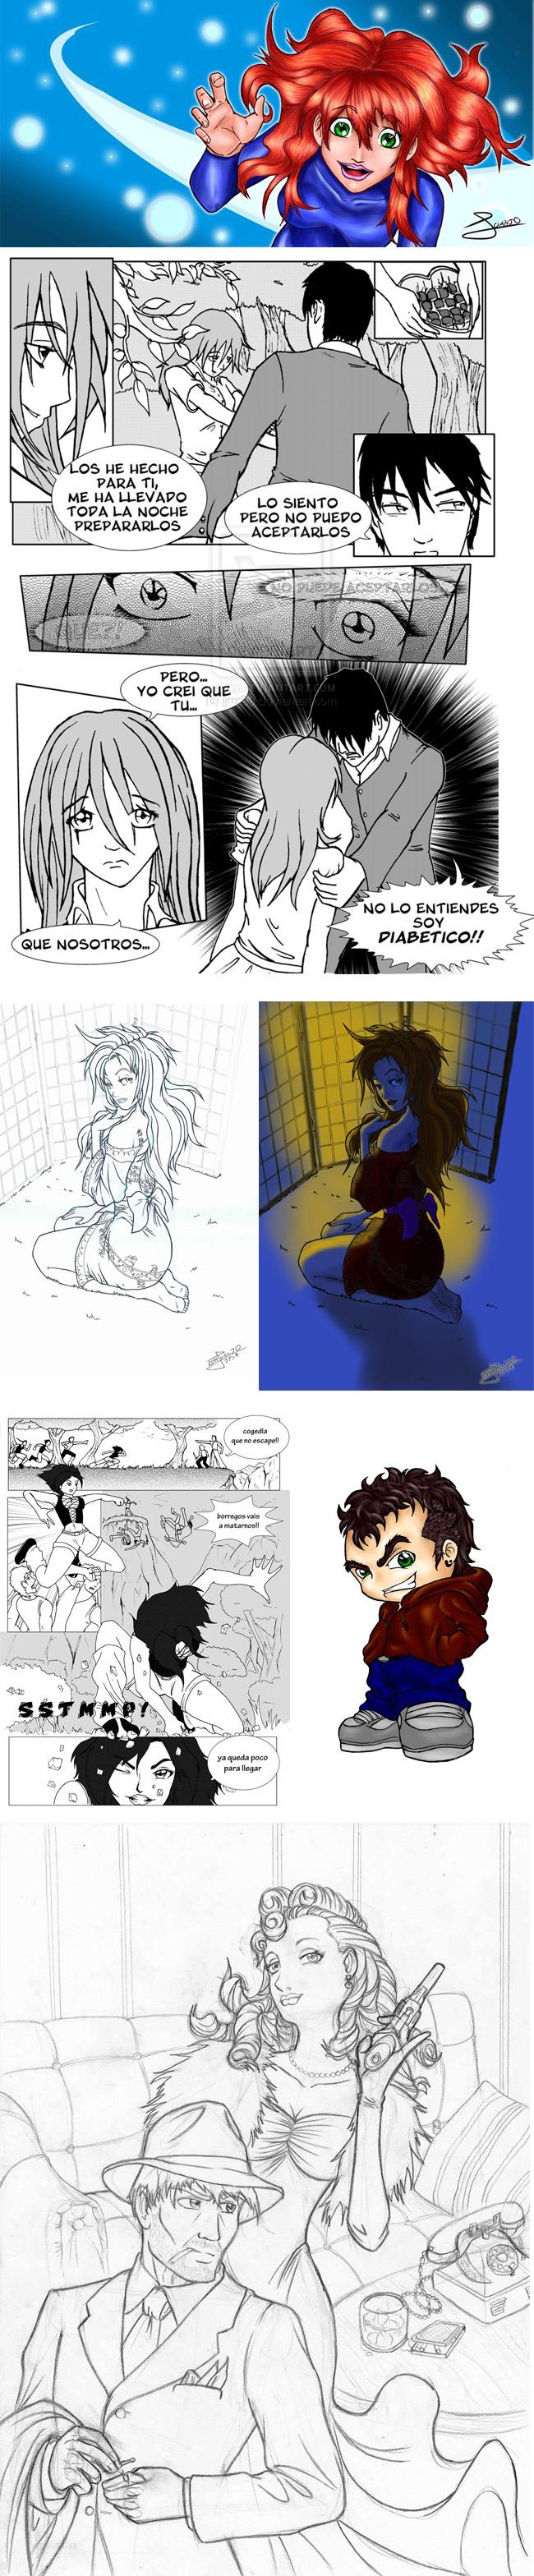 manga-juanjo-trabajos-alumnos-comic-madrid-academiac10